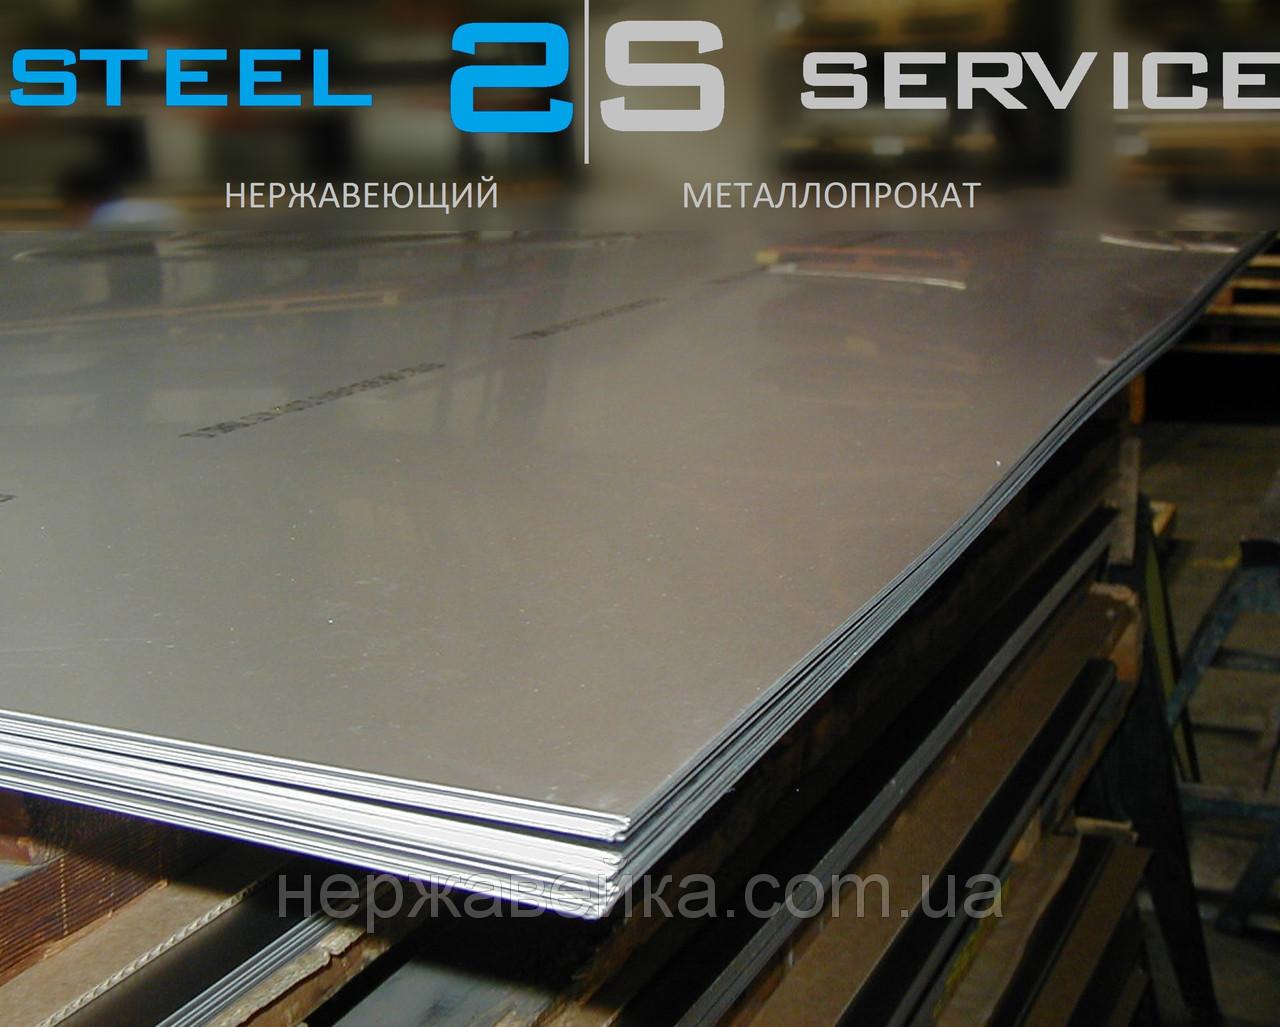 Листовая нержавейка 2х1500х3000мм  AISI 316L(03Х17Н14М3) 2B - матовый,  кислотостойкий